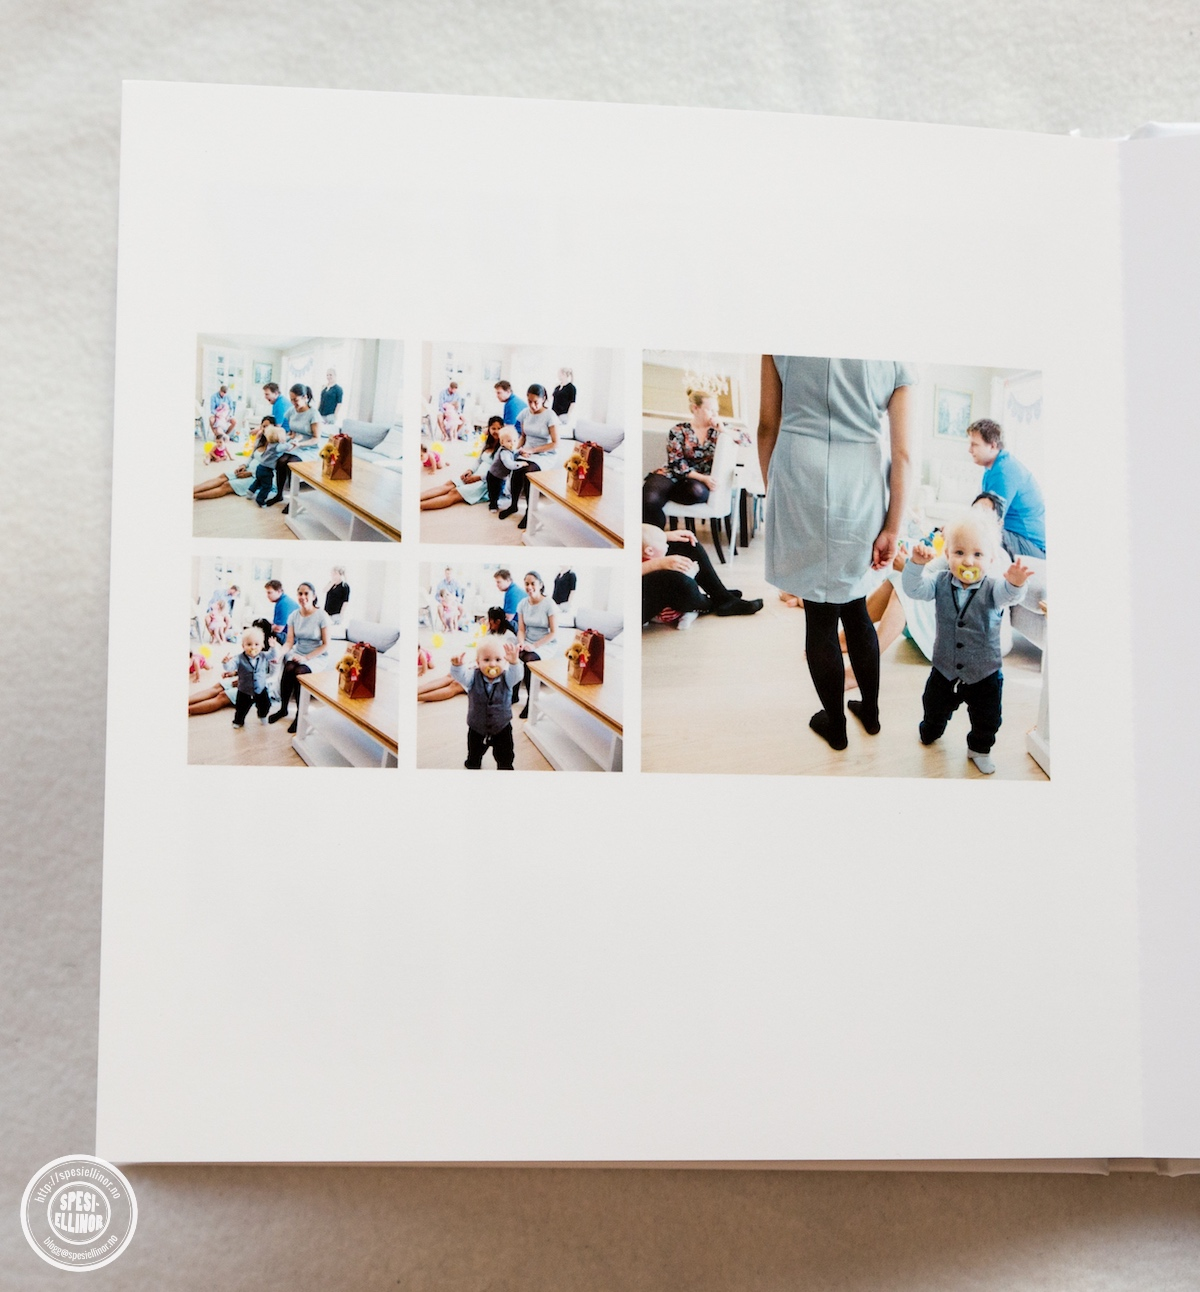 20171012-fotobok006.jpg